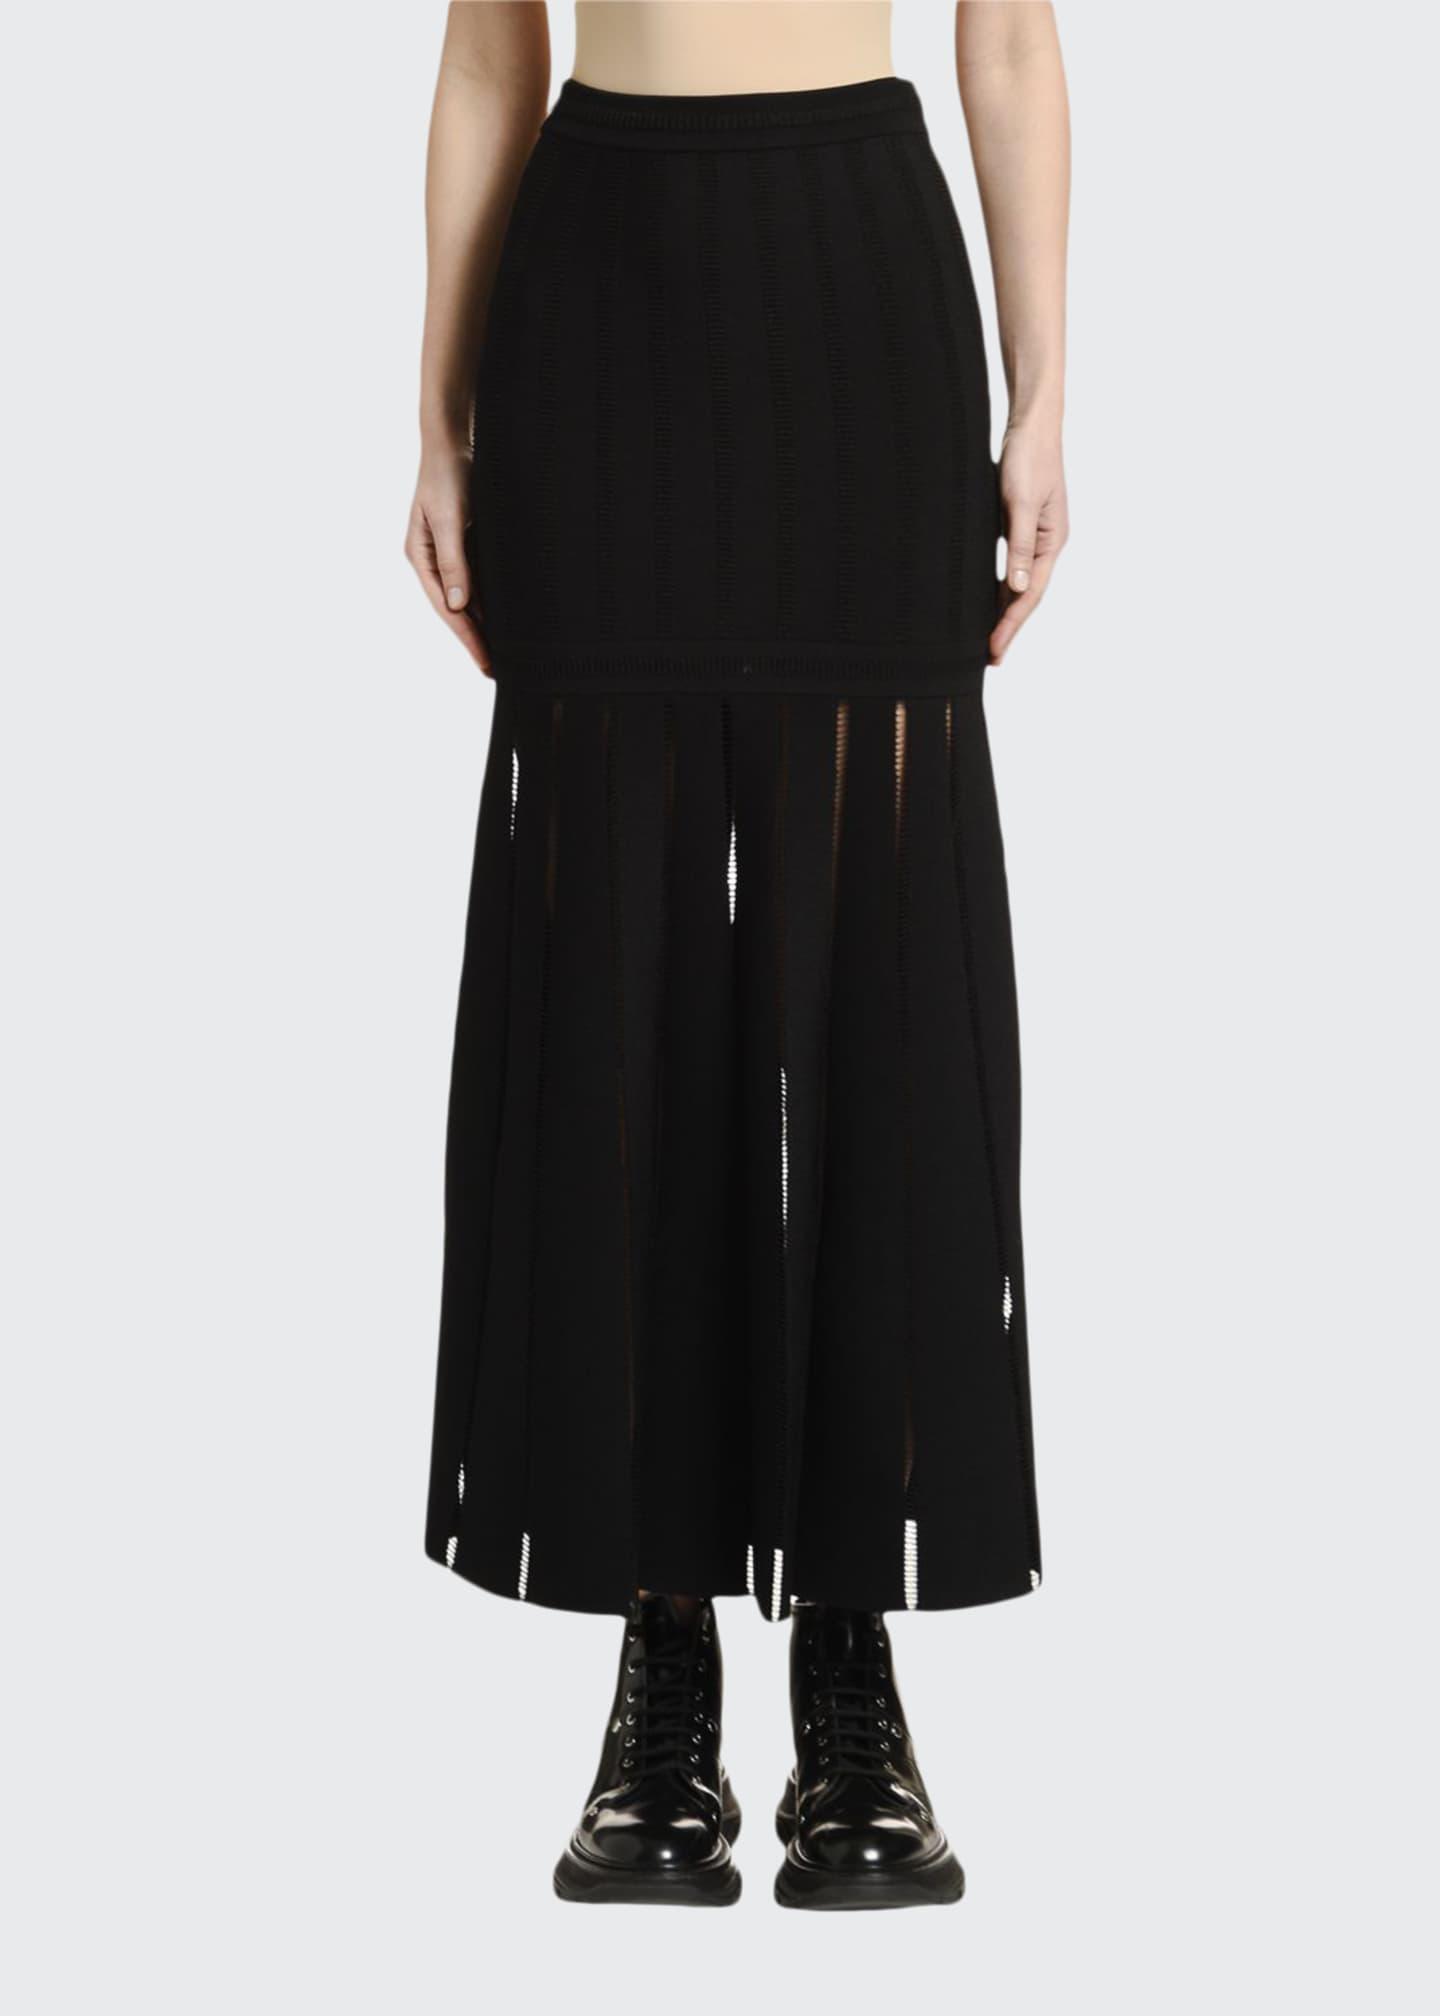 Alexander McQueen Sheer-Striped Midi Skirt